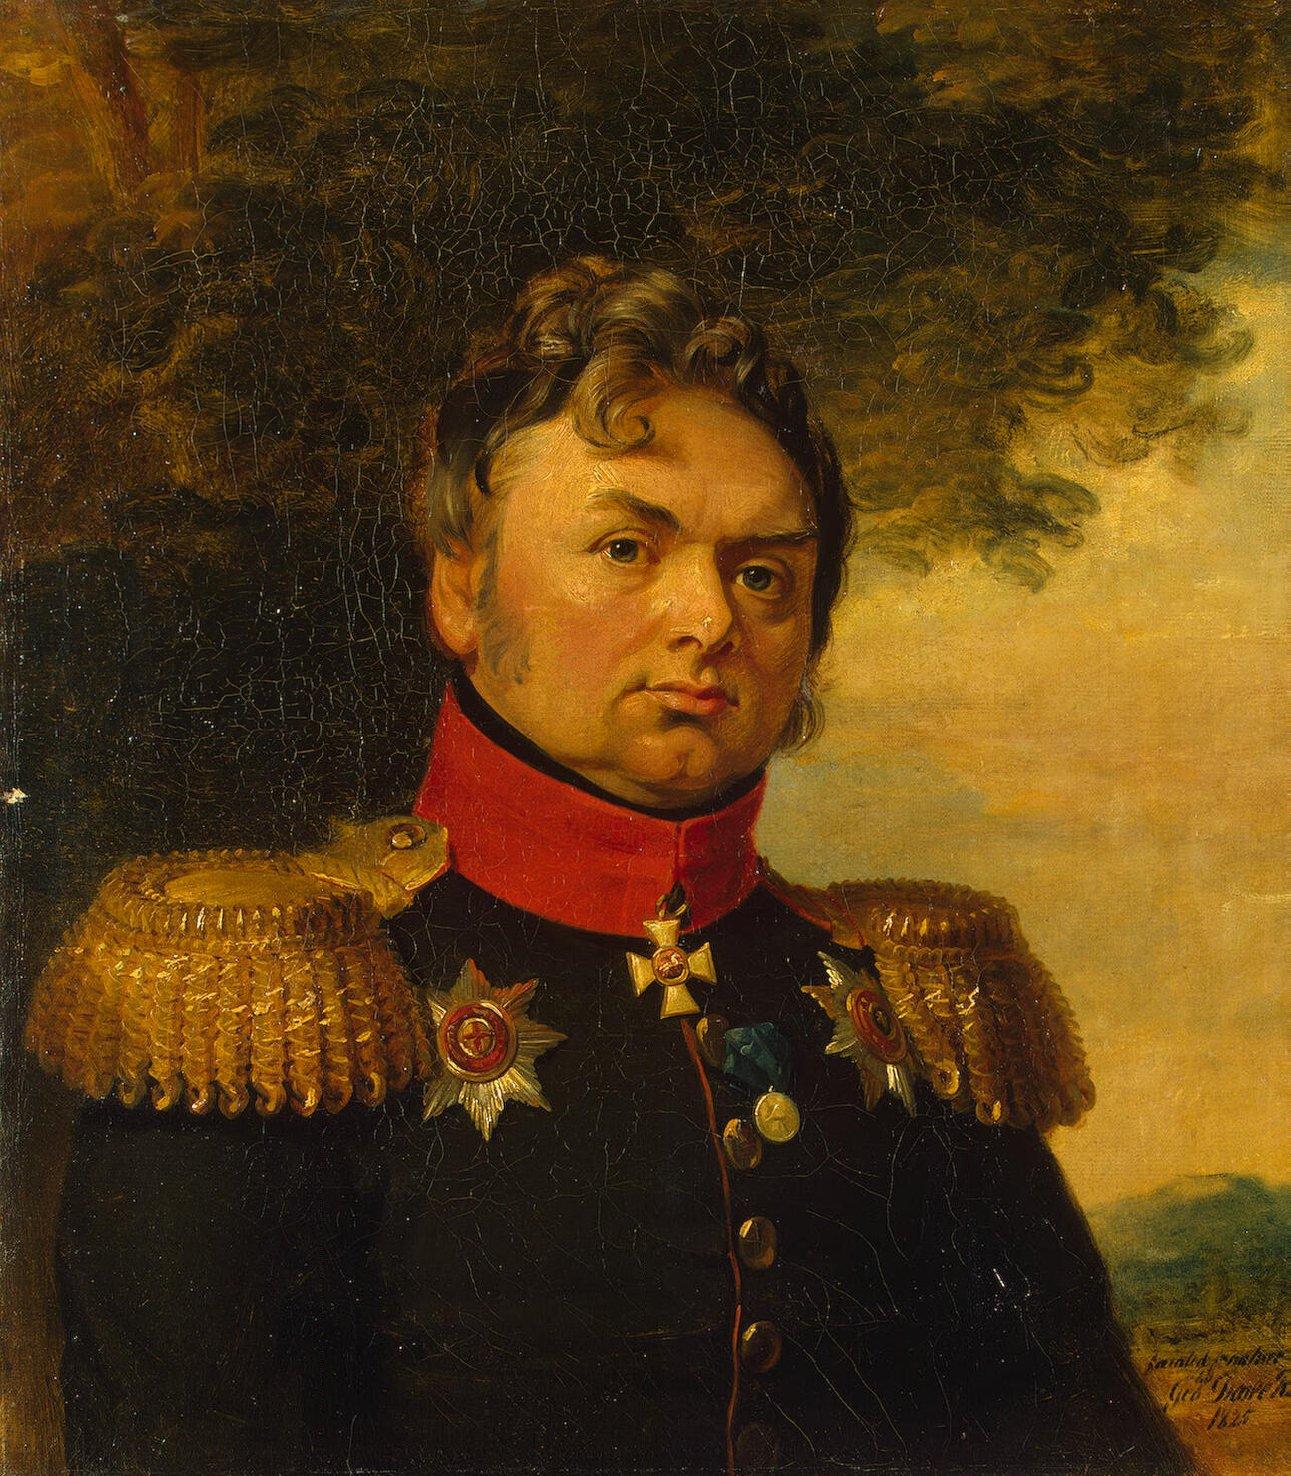 Чоглоков, Павел Николаевич